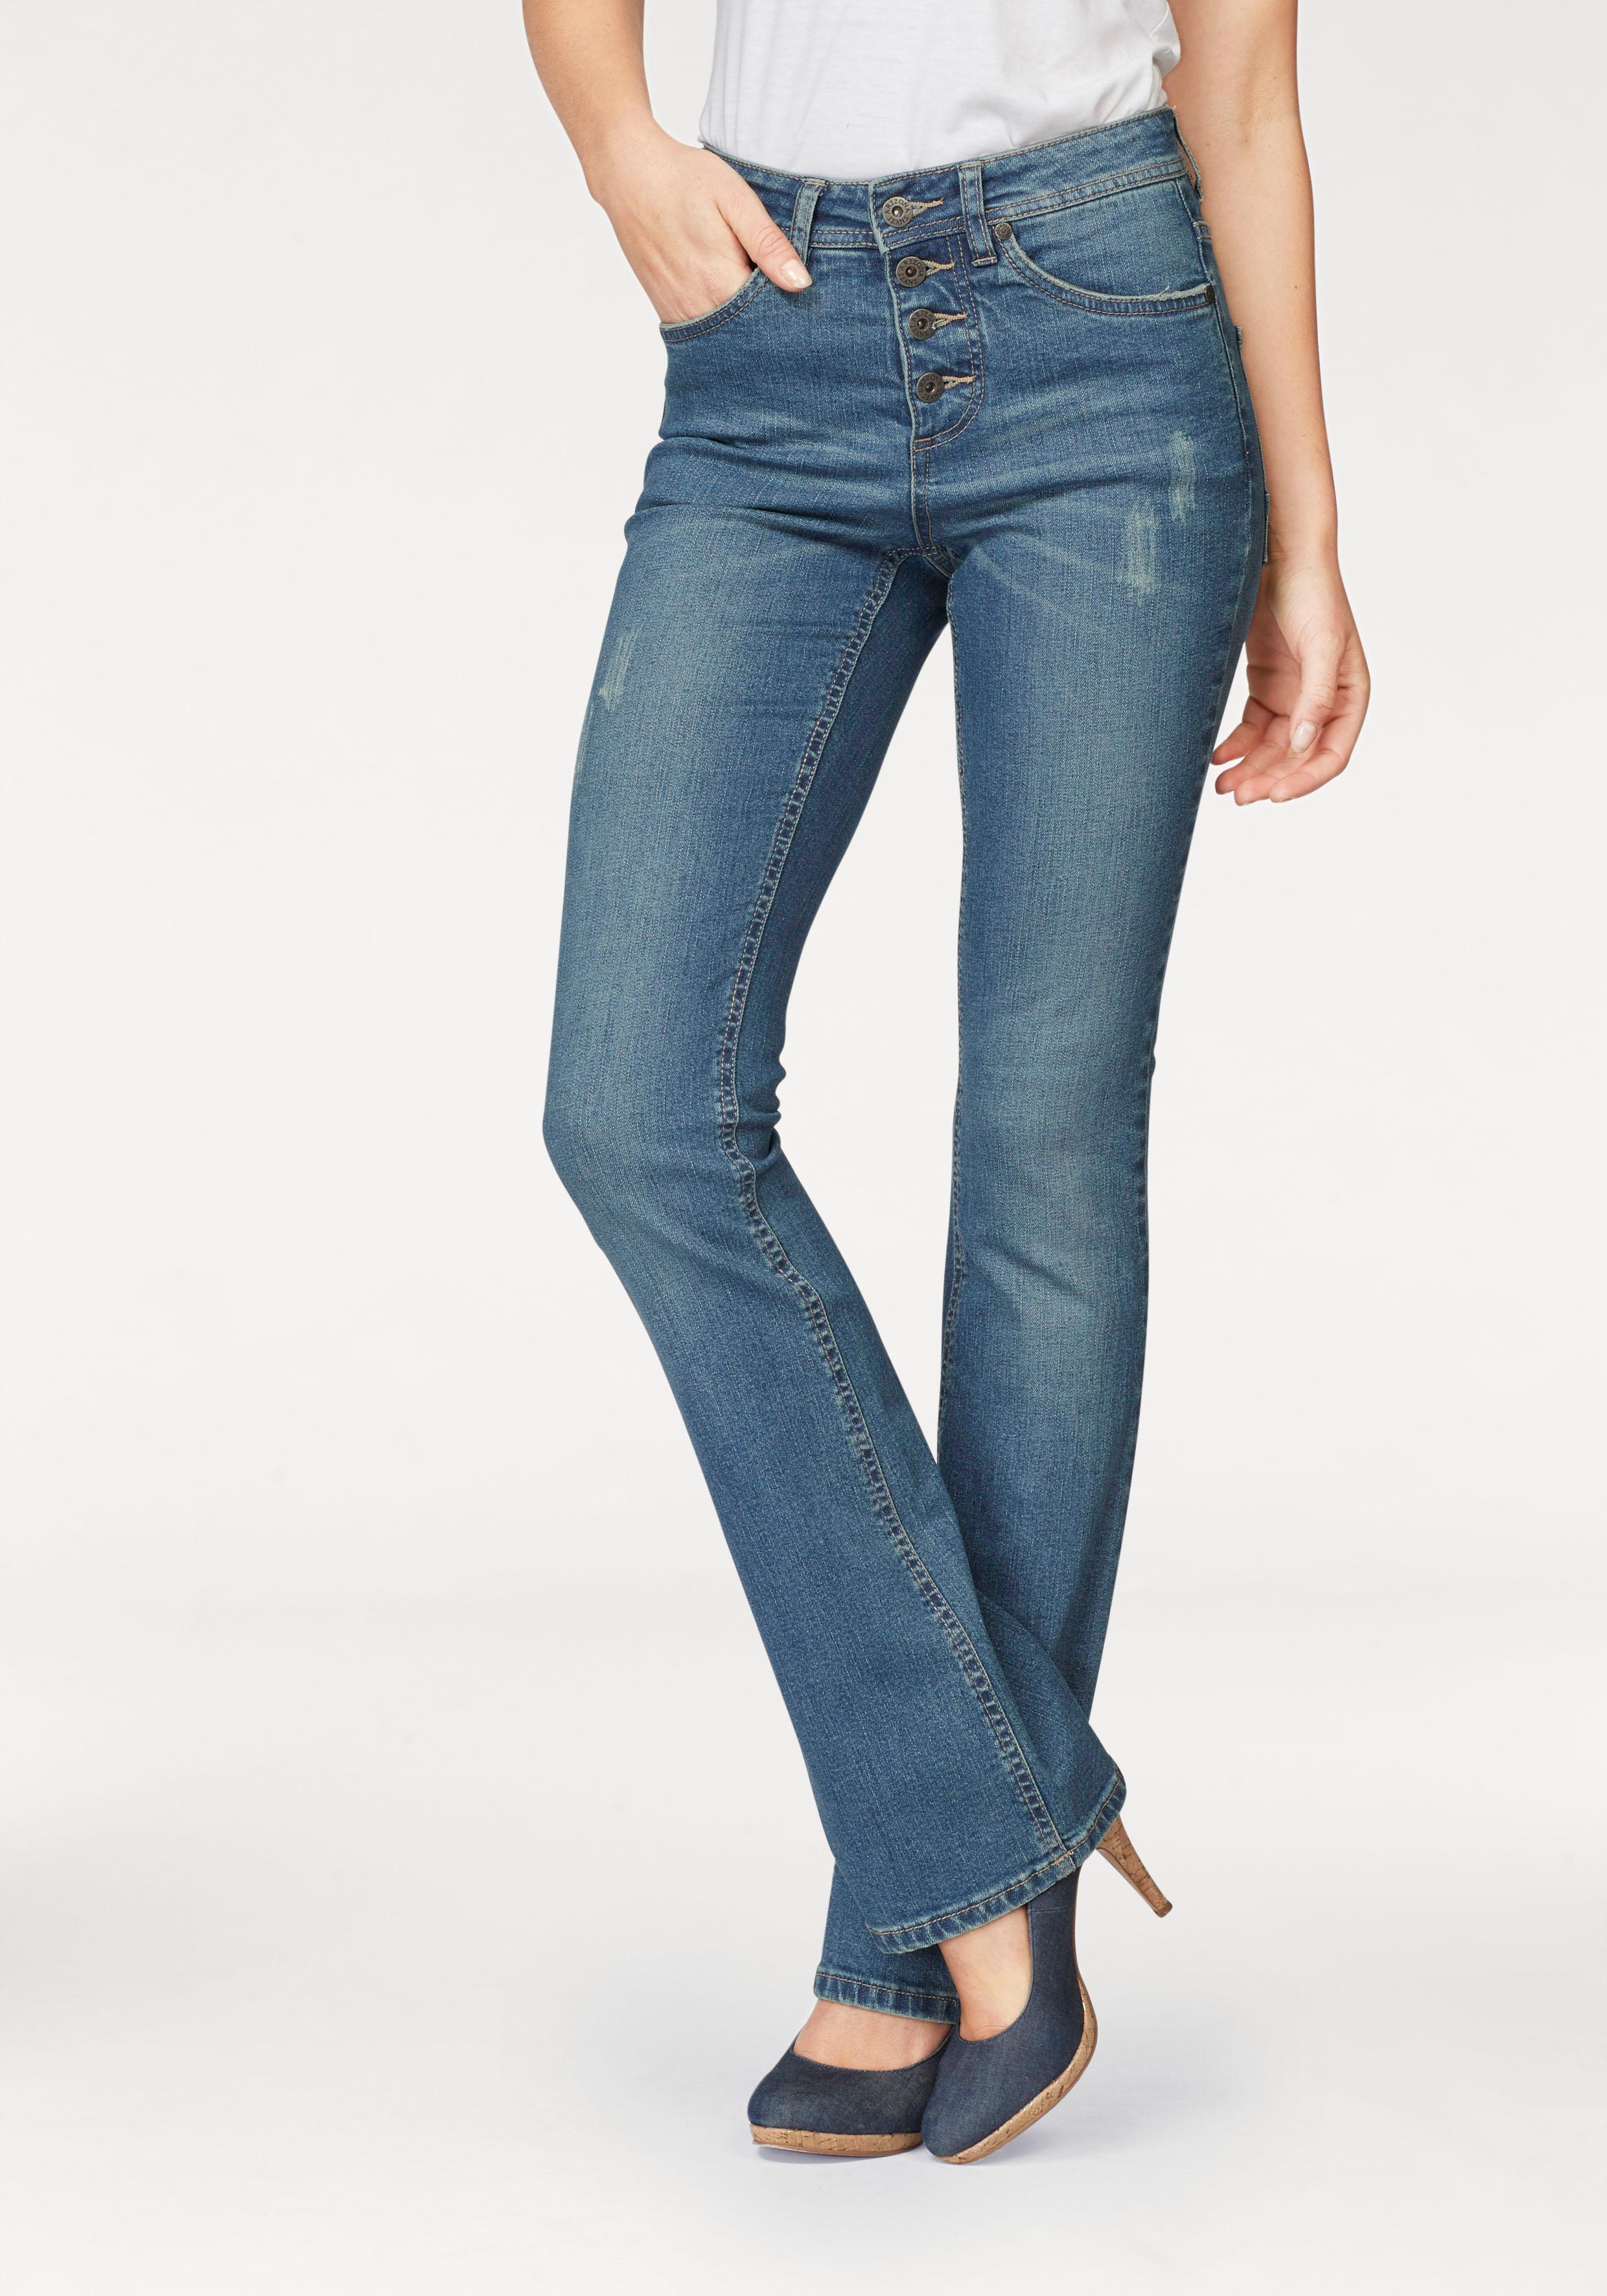 Image of Arizona Bootcut-Jeans »mit sichtbarer Knopfleiste«